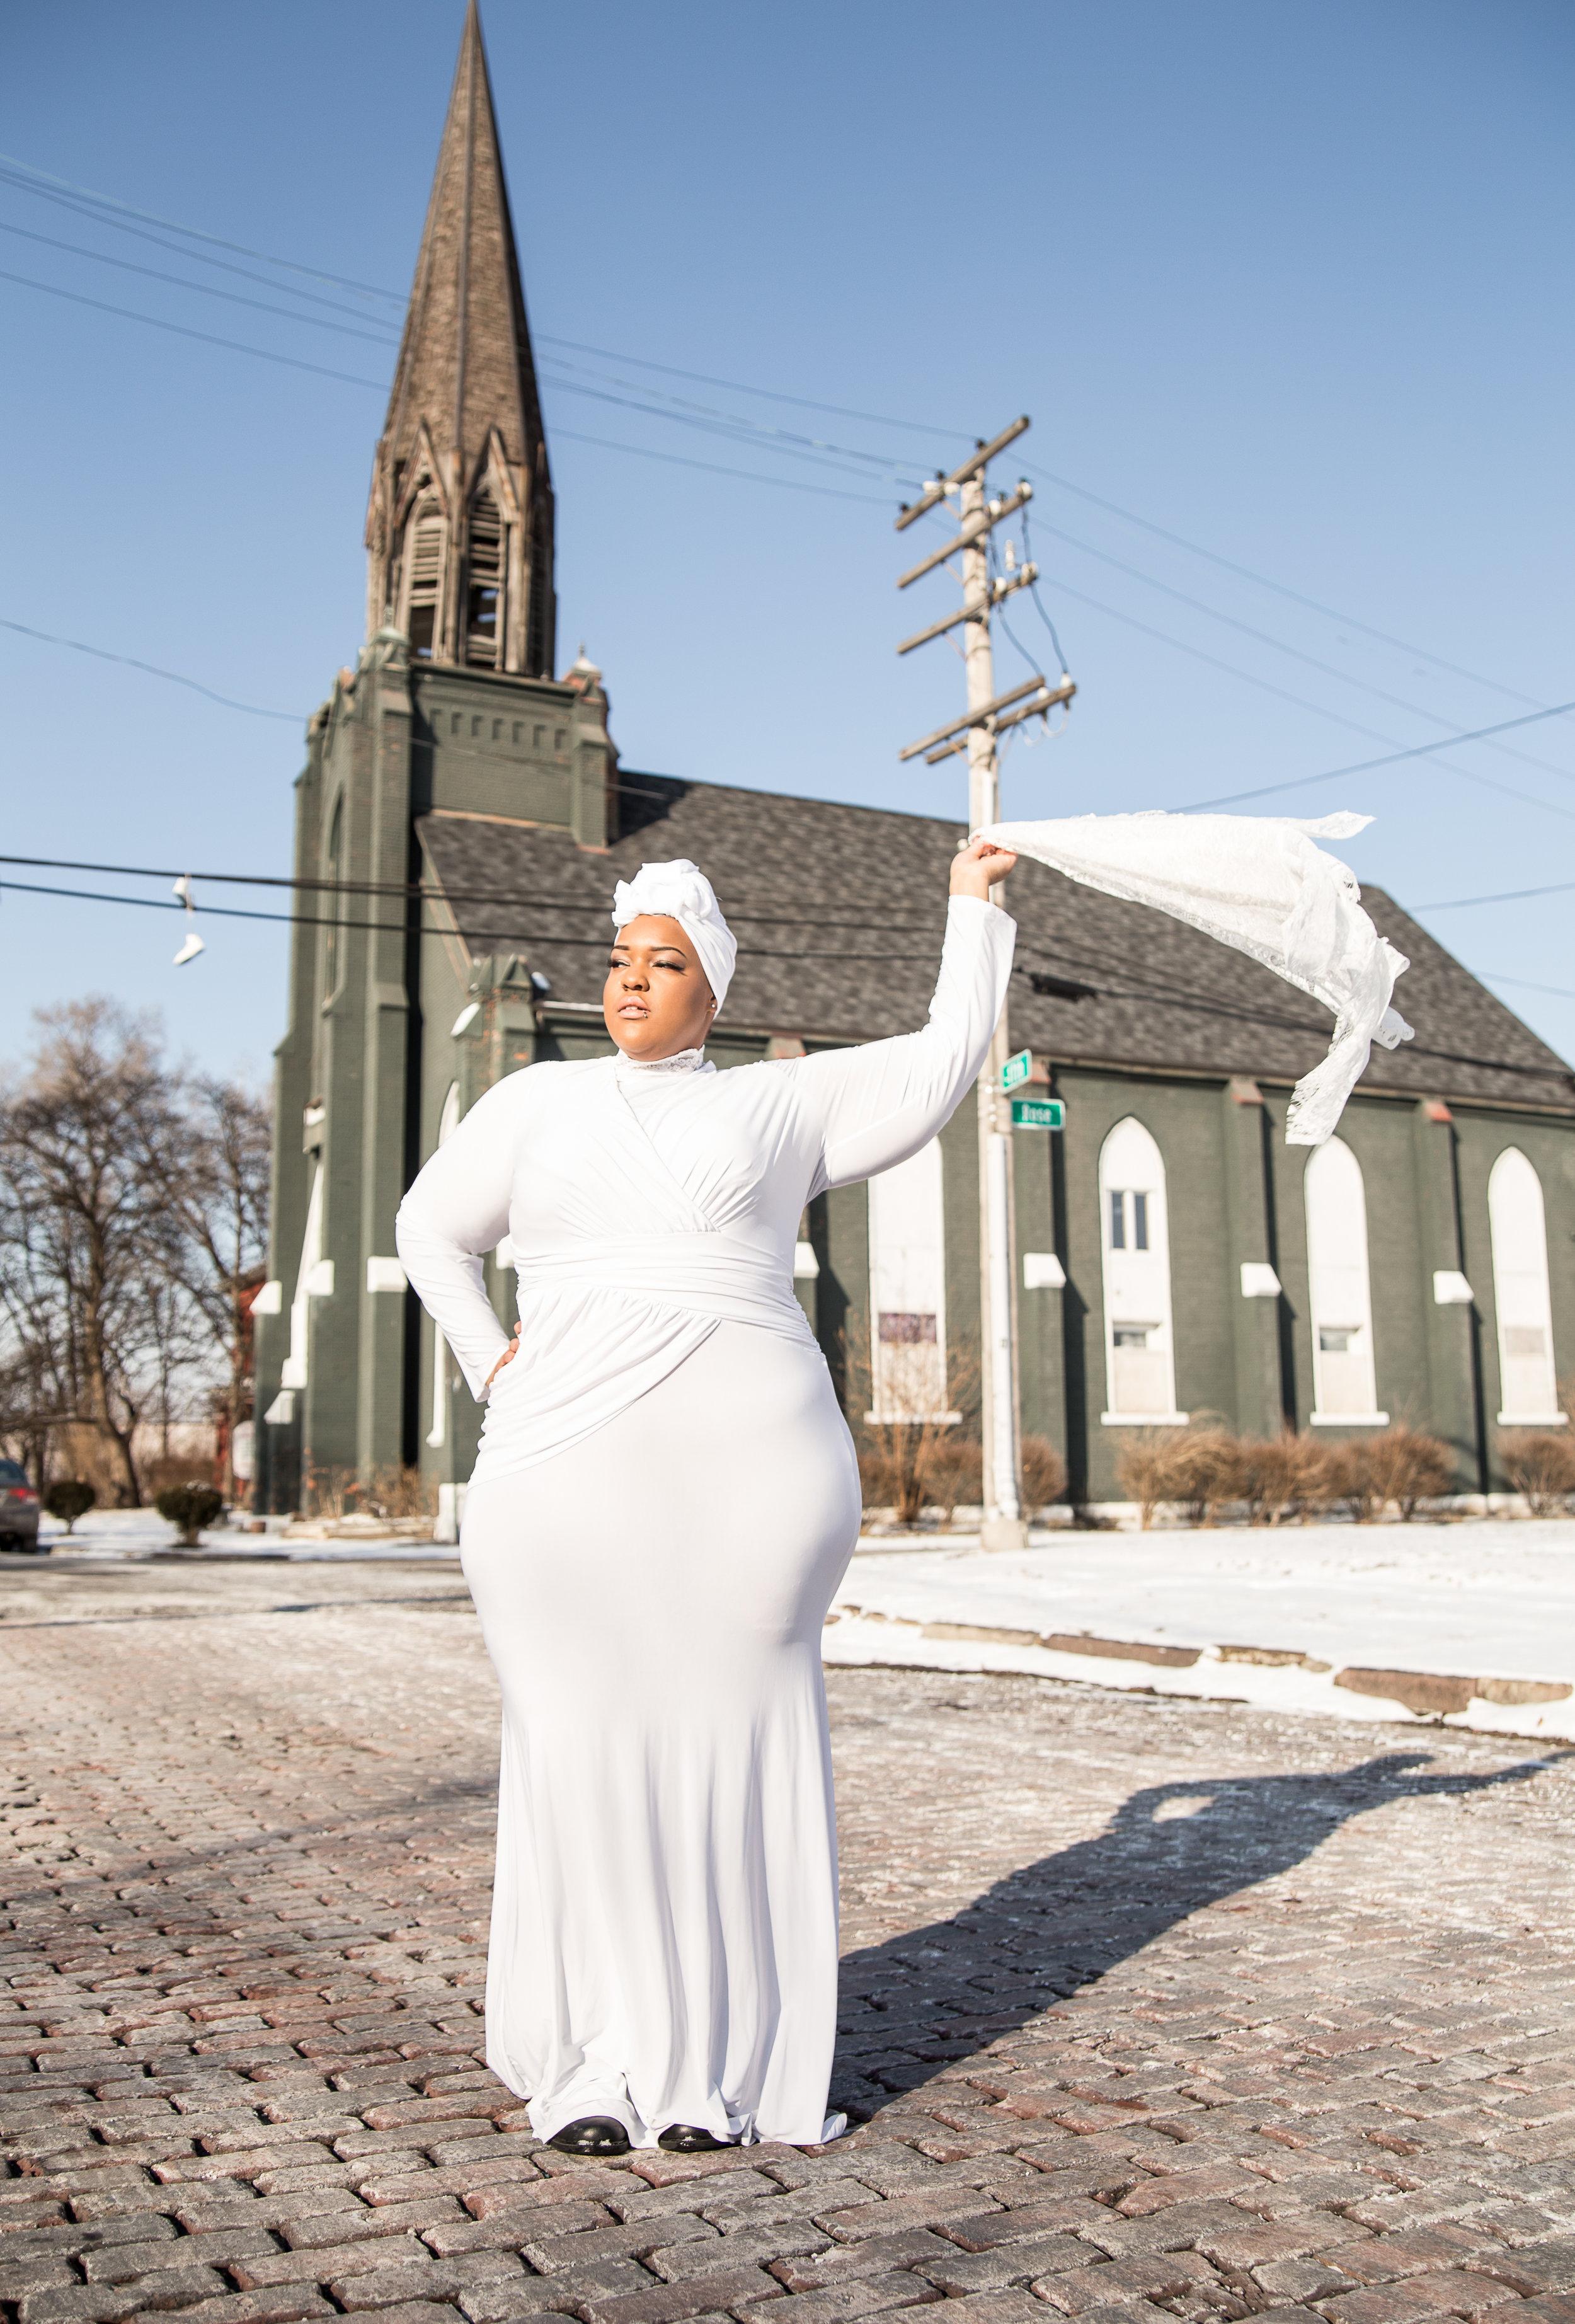 Leah-Vernon-Detroit-Style-Blogger-Body-Positive-Muslim-Girl-Fashion-Assemble+-Sound-2